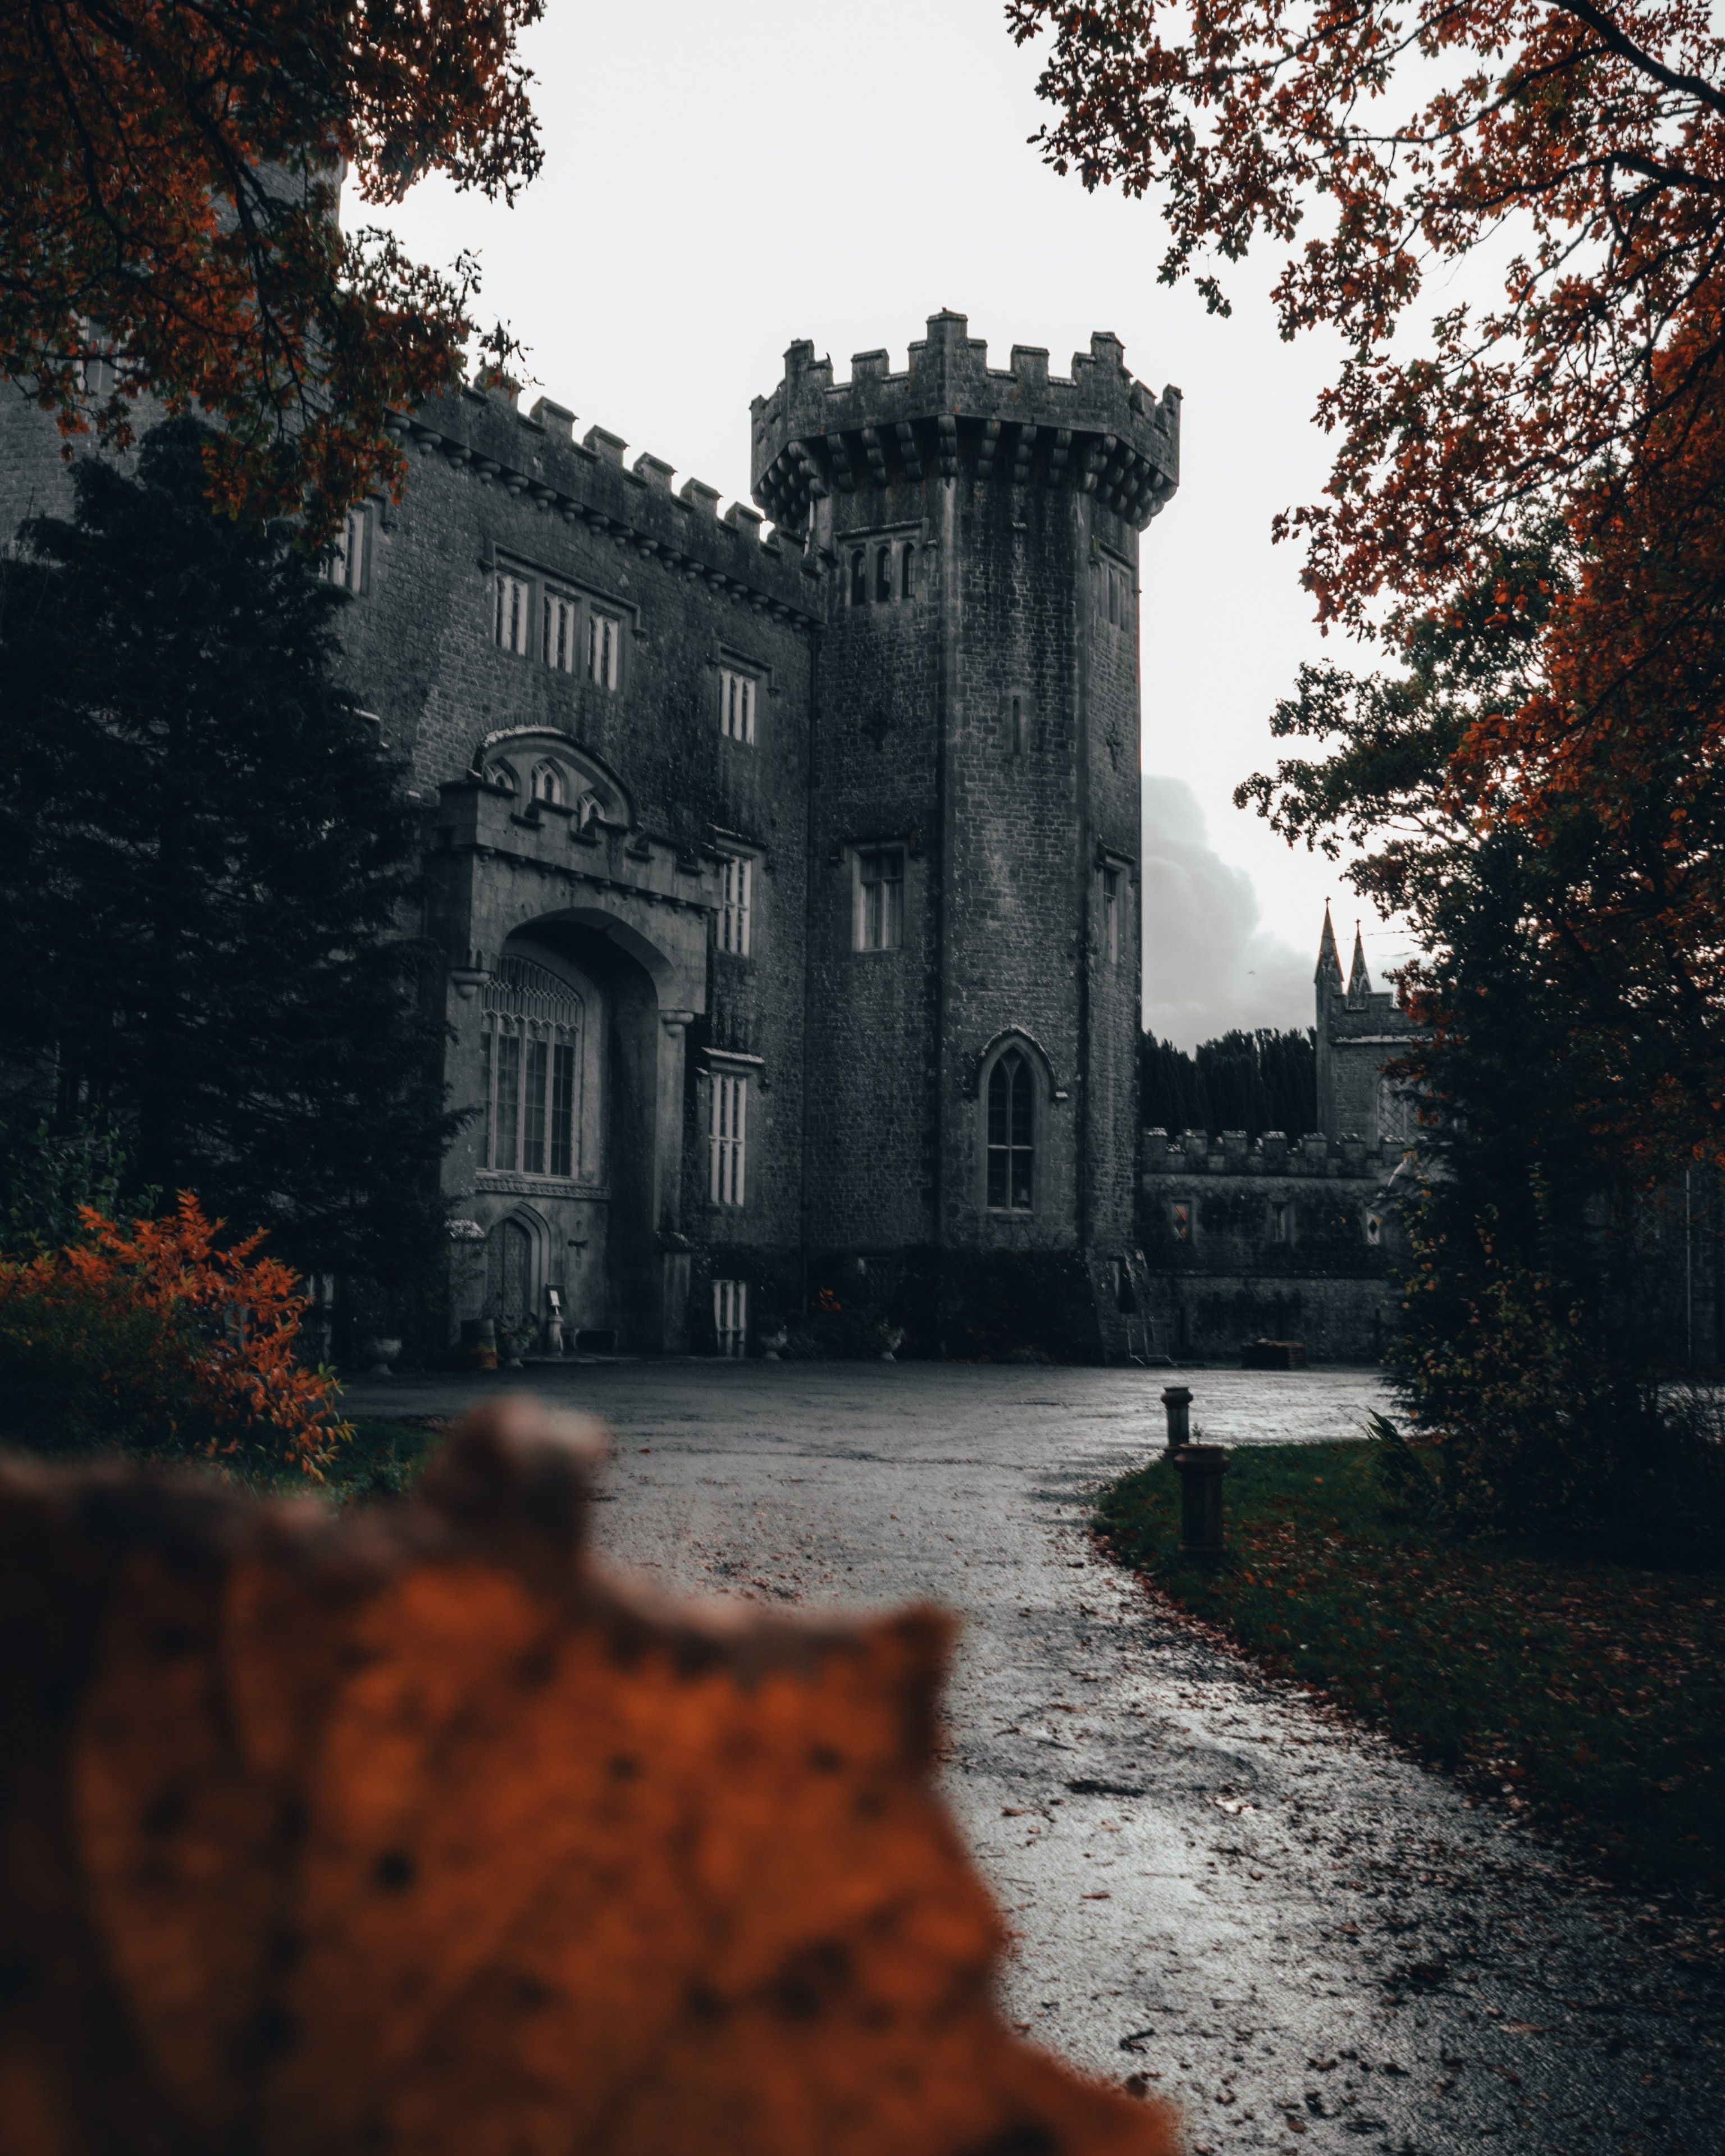 Offaly (kreivikunta), Irlanti